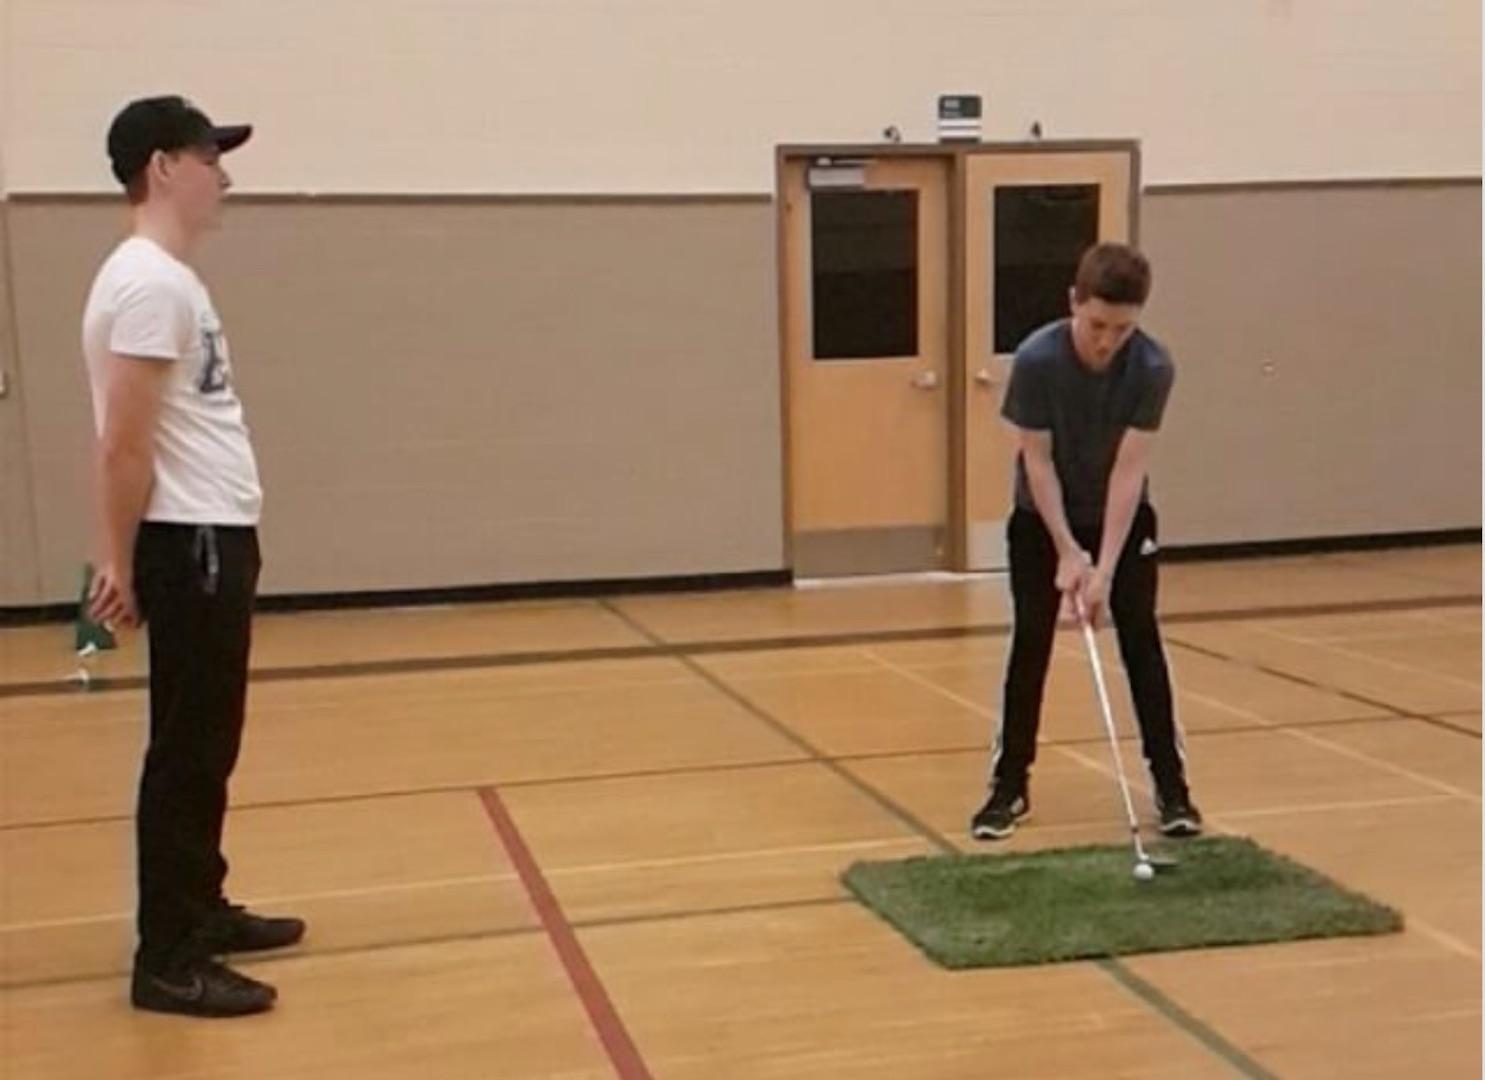 Bowling alley trick shot